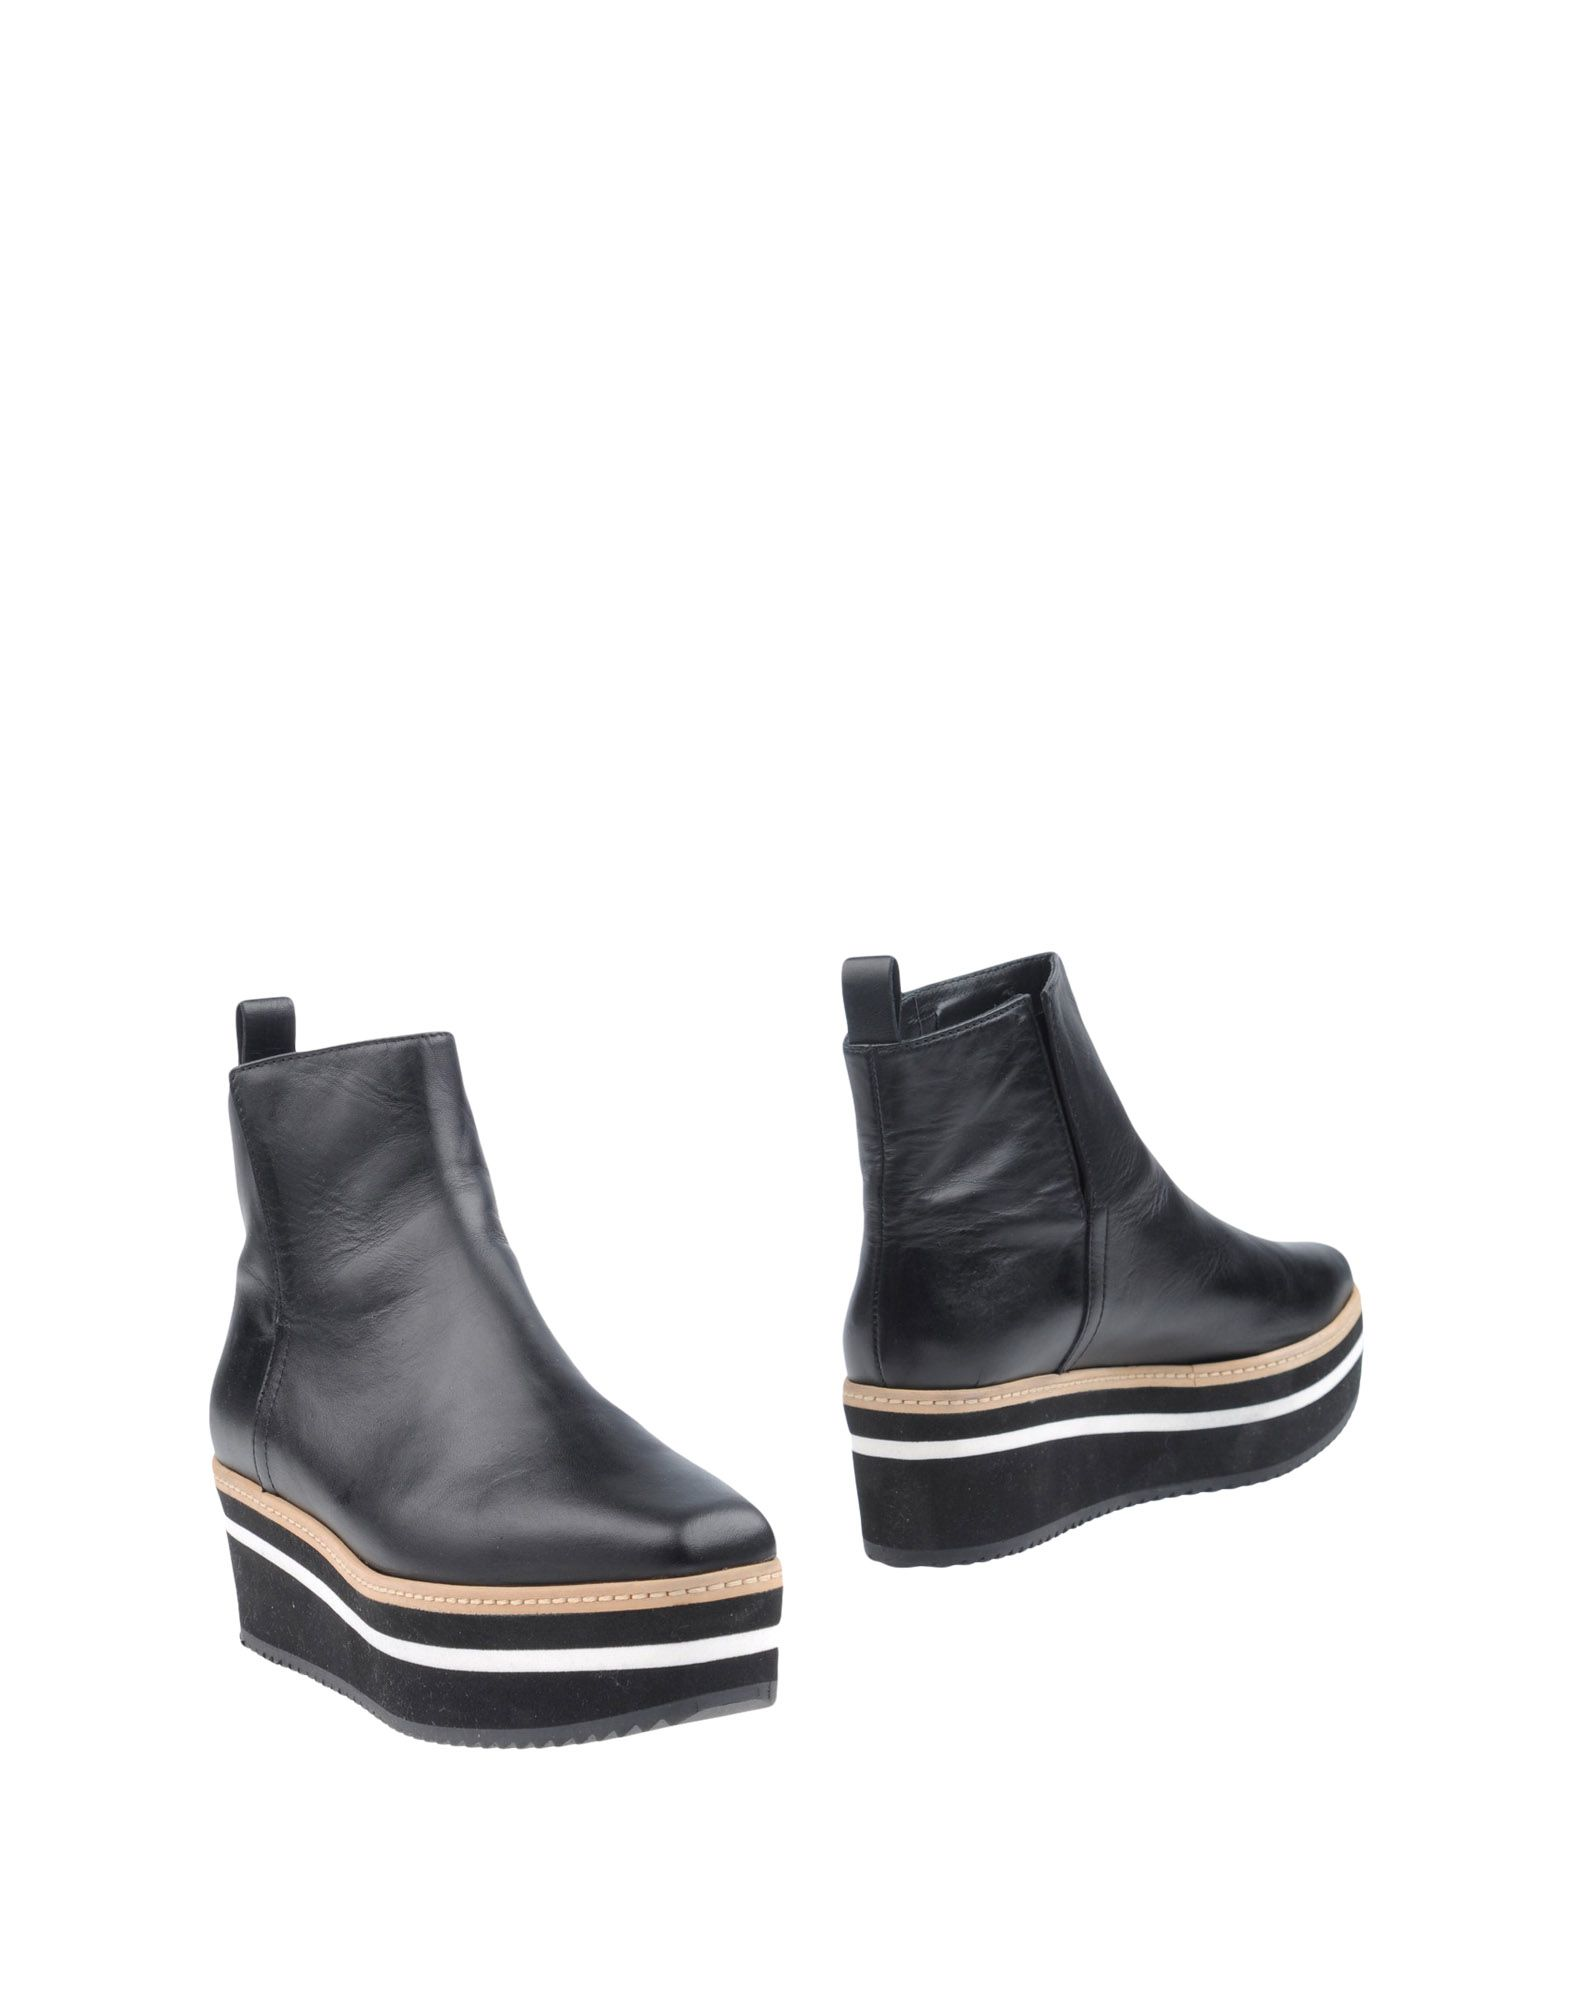 Liviana Conti Stiefelette Damen  11243906WCGut aussehende strapazierfähige Schuhe